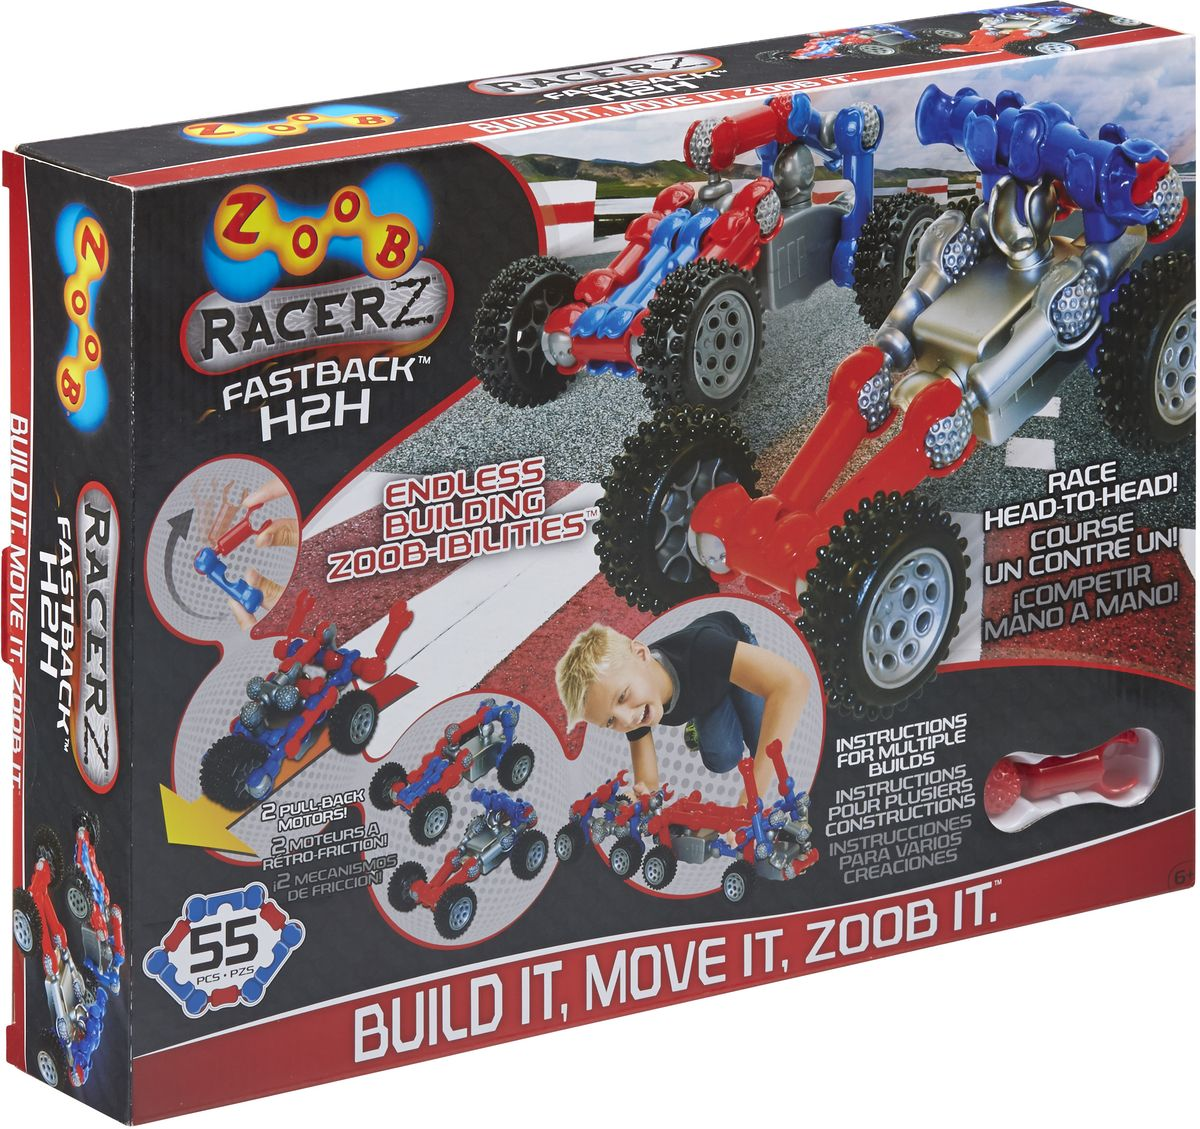 Фото - Zoob Racer Z Конструктор Fastback H2H конструктор автомобильный парк 7 в 1